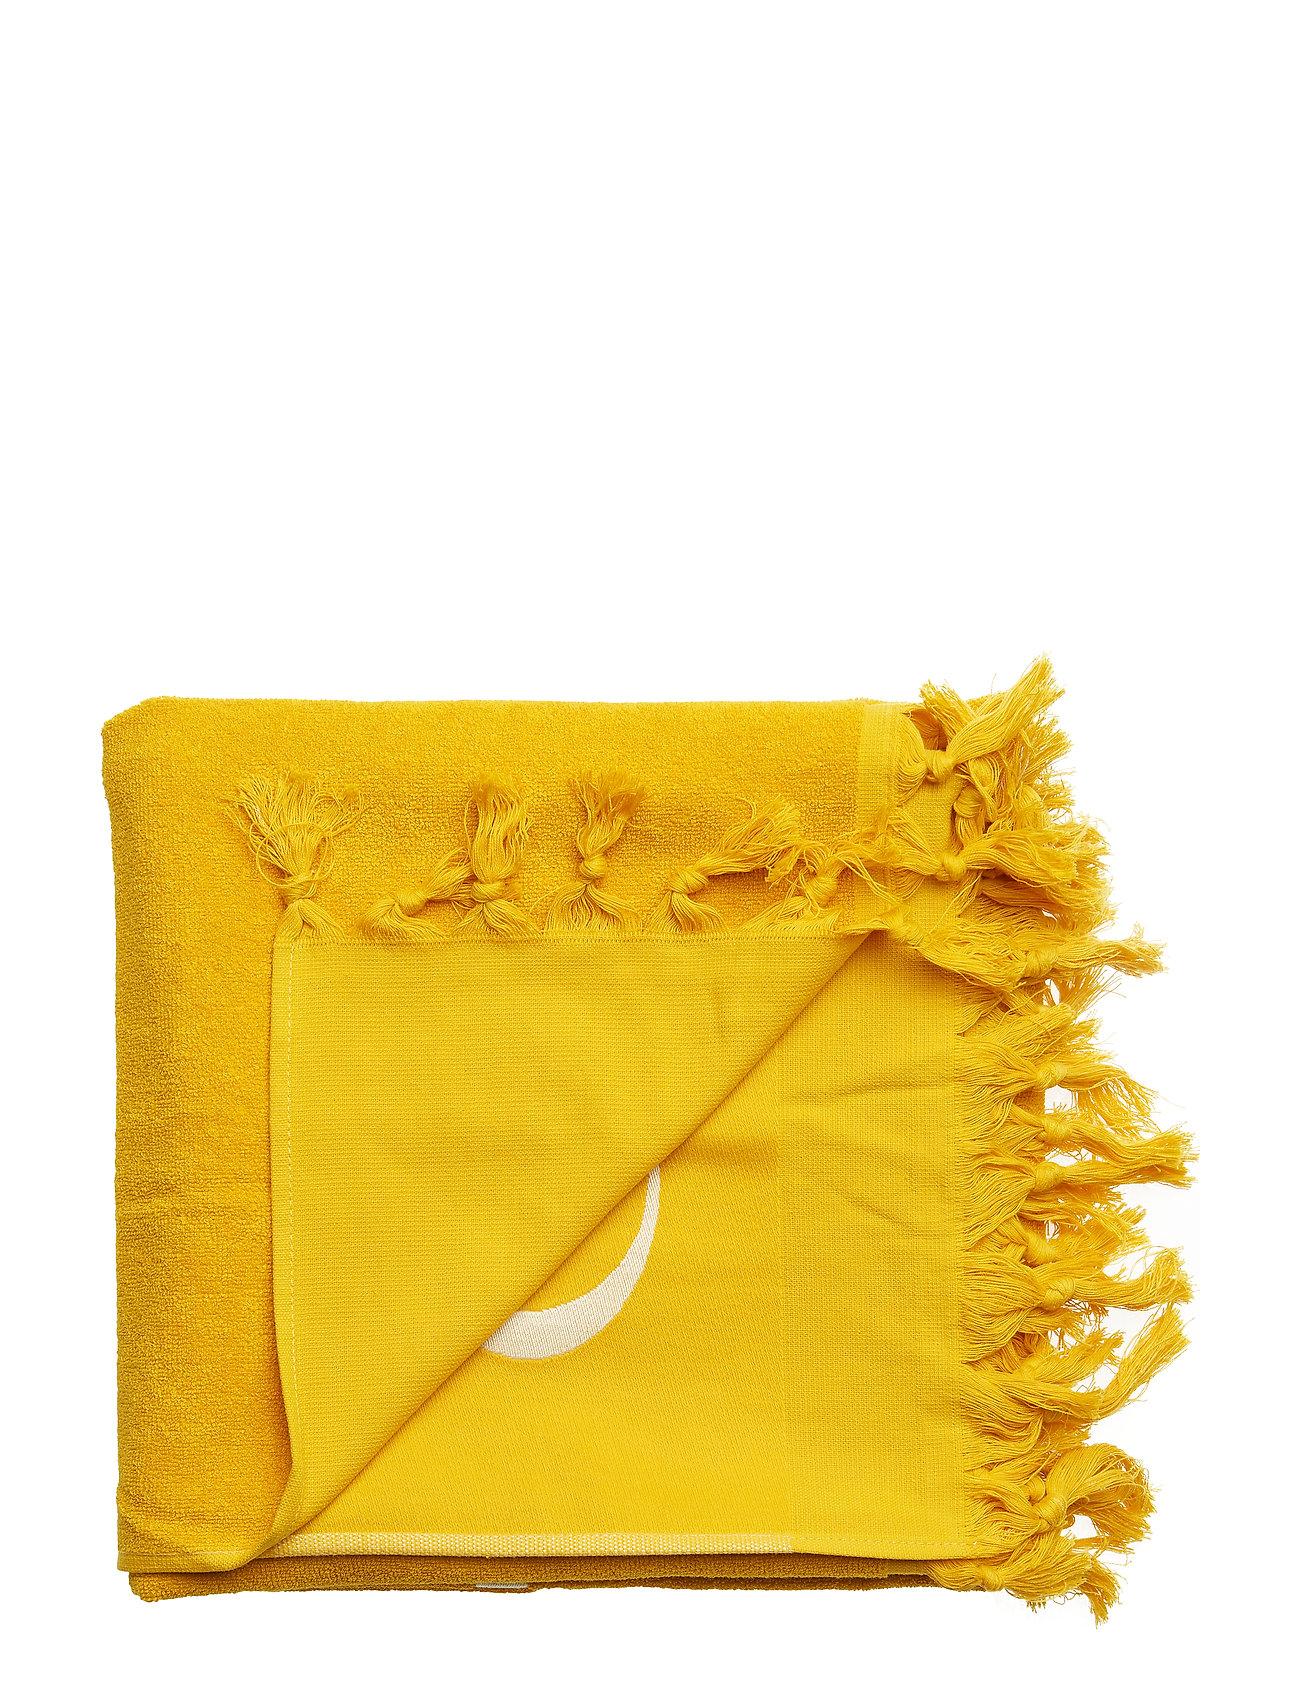 Marie Jo Zita Beach Towel Badkläder